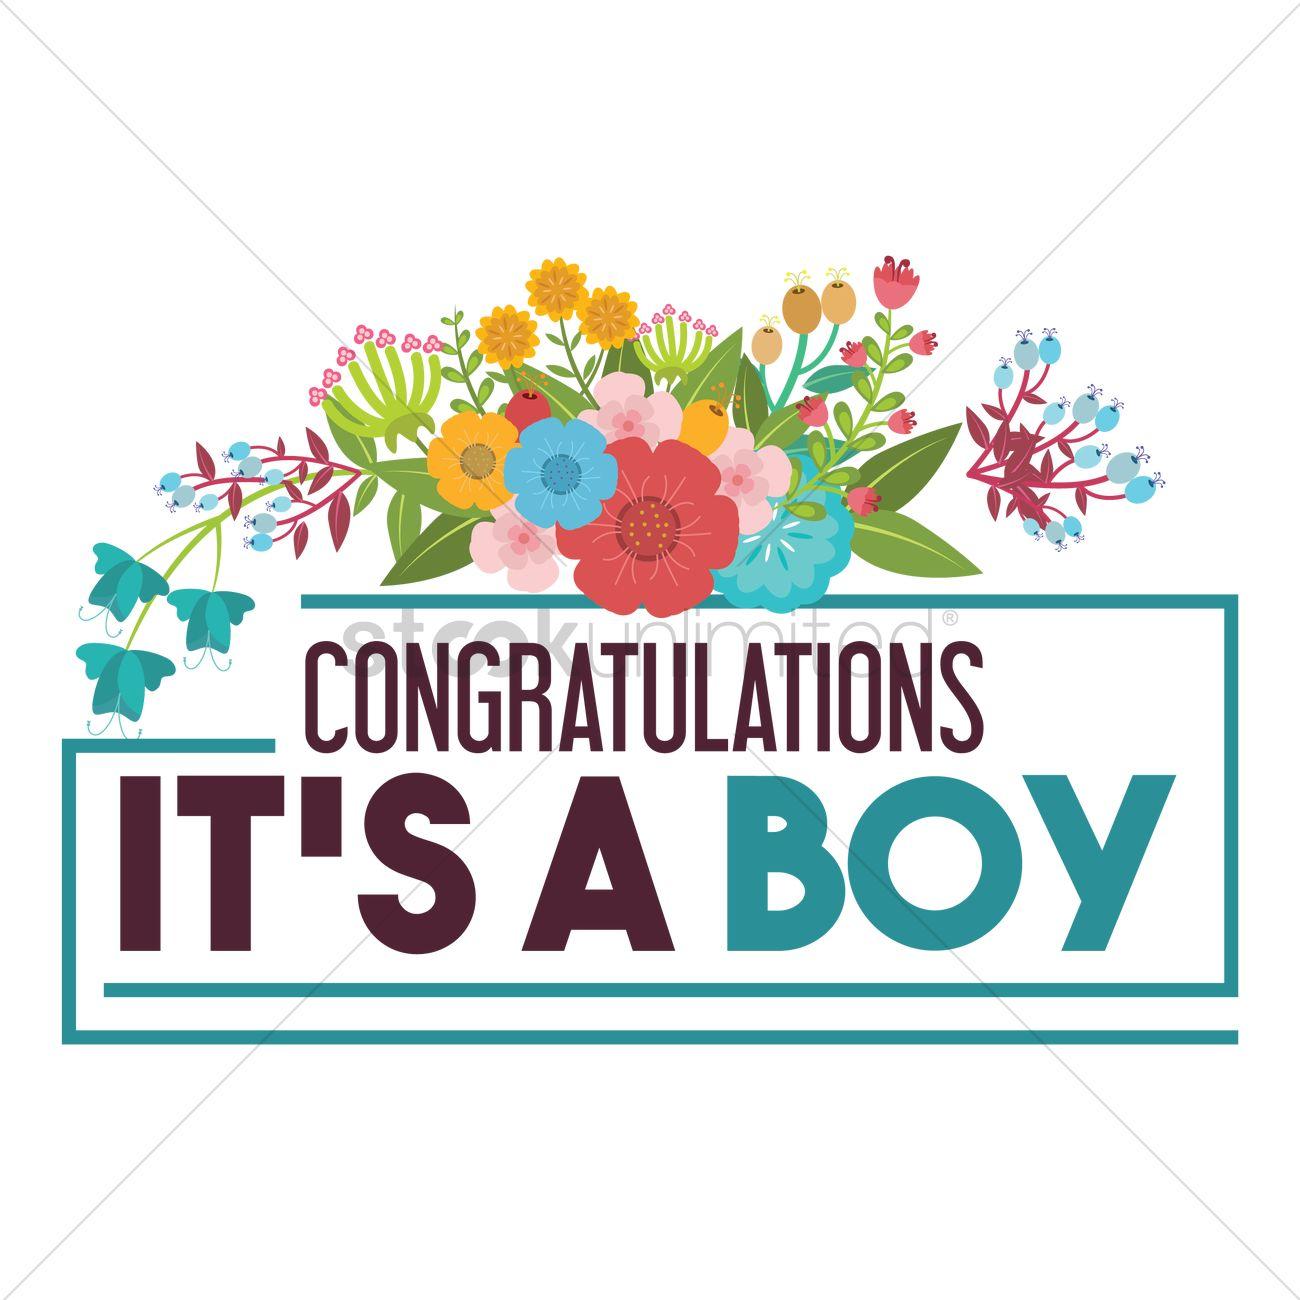 congratulations its a boy vector graphic